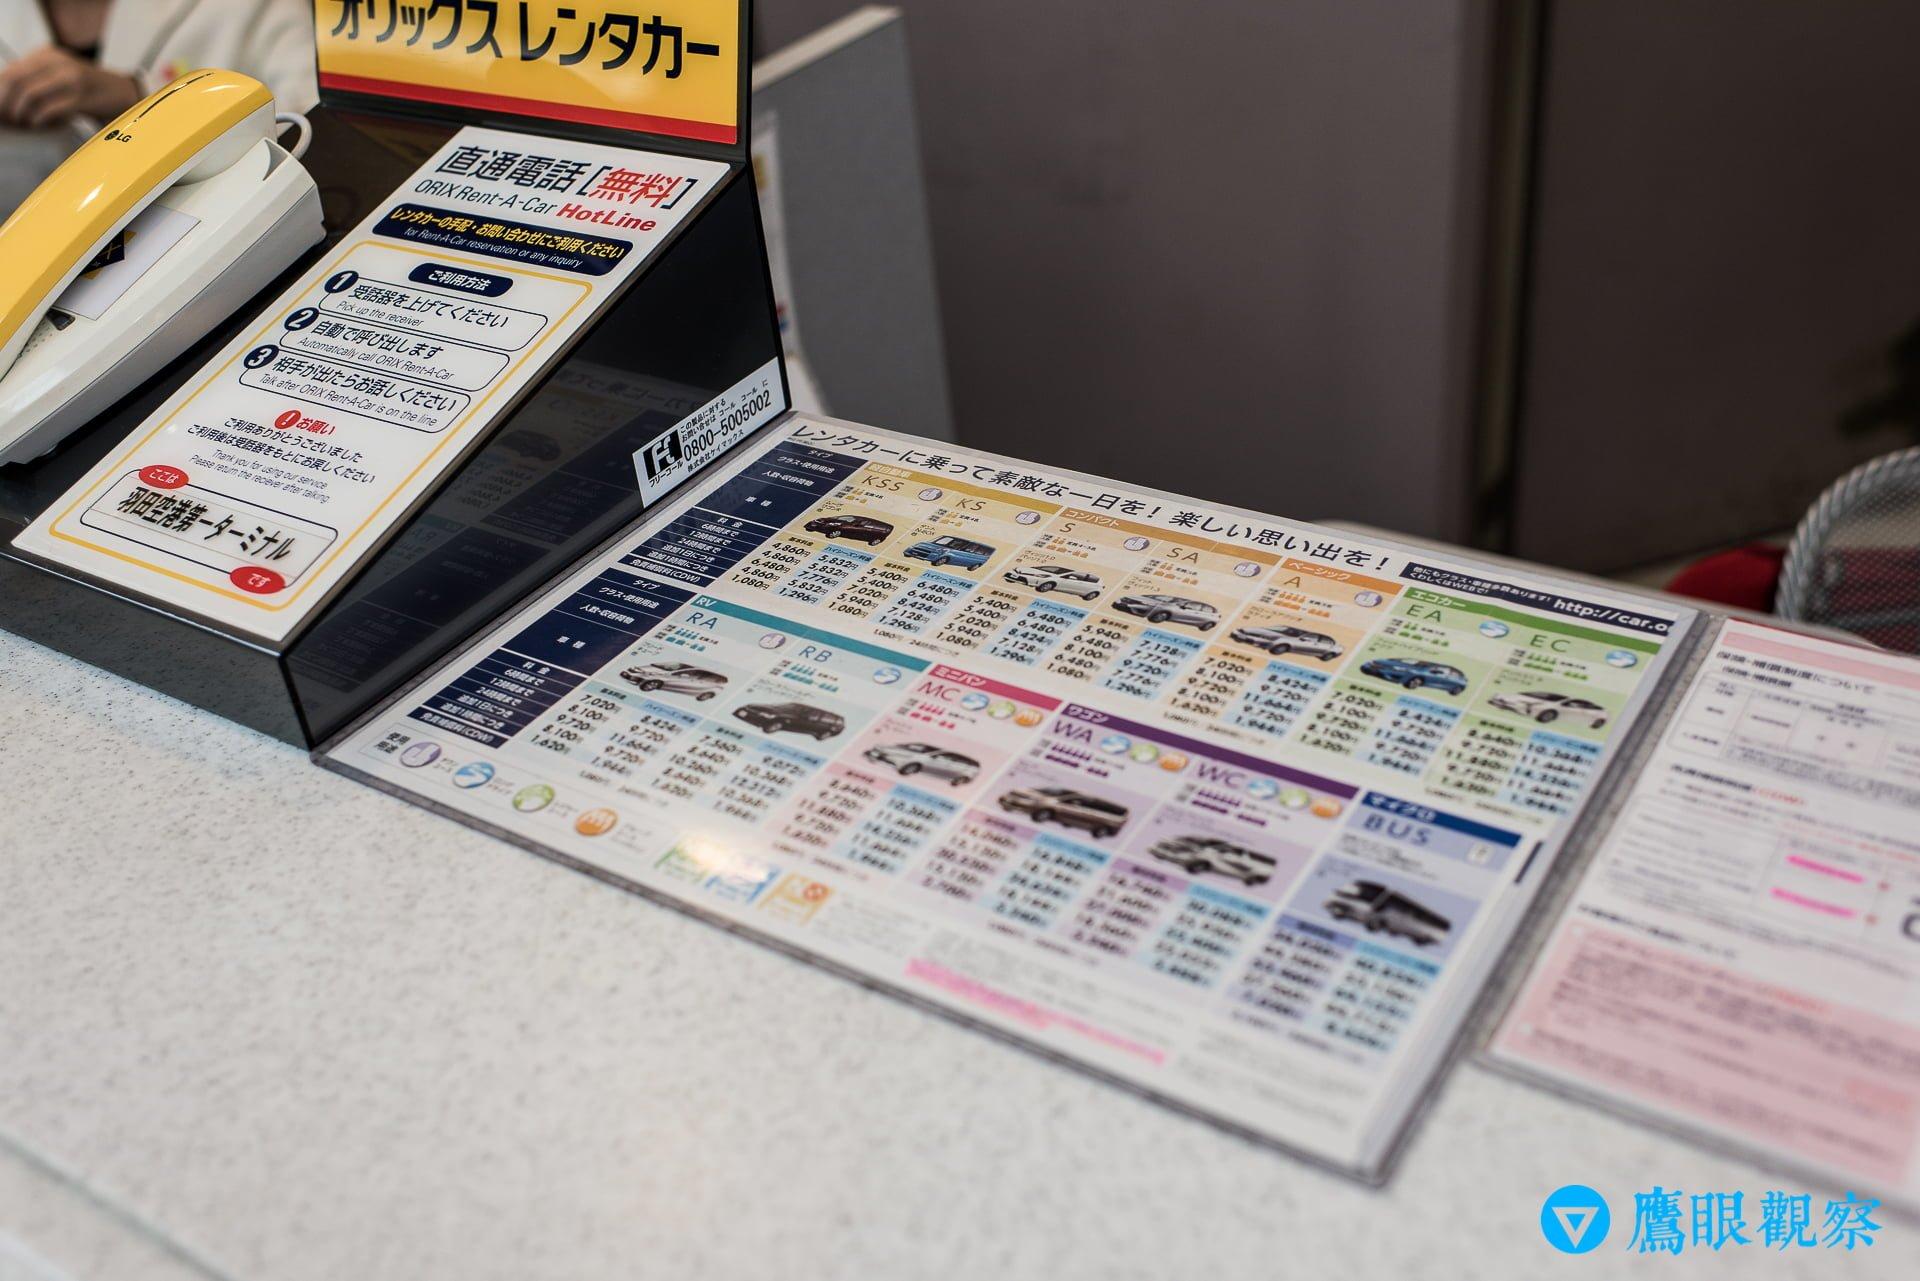 Rental Cars in Airport Tokyo Japan with Orix 3 日本租車:從東京機場自駕暢遊北關東 3 縣的旅遊行程預定、租取還車教學